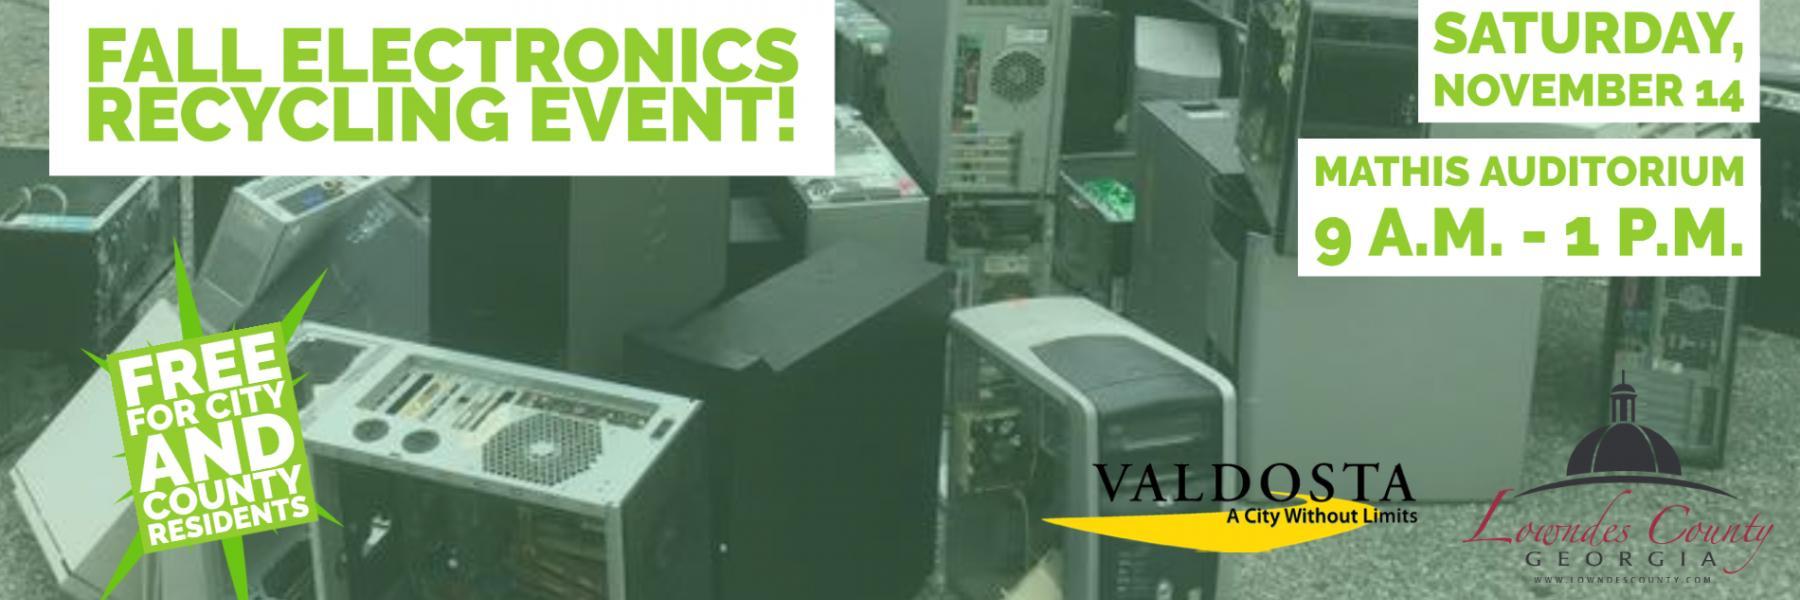 Fall Electronics Recycling